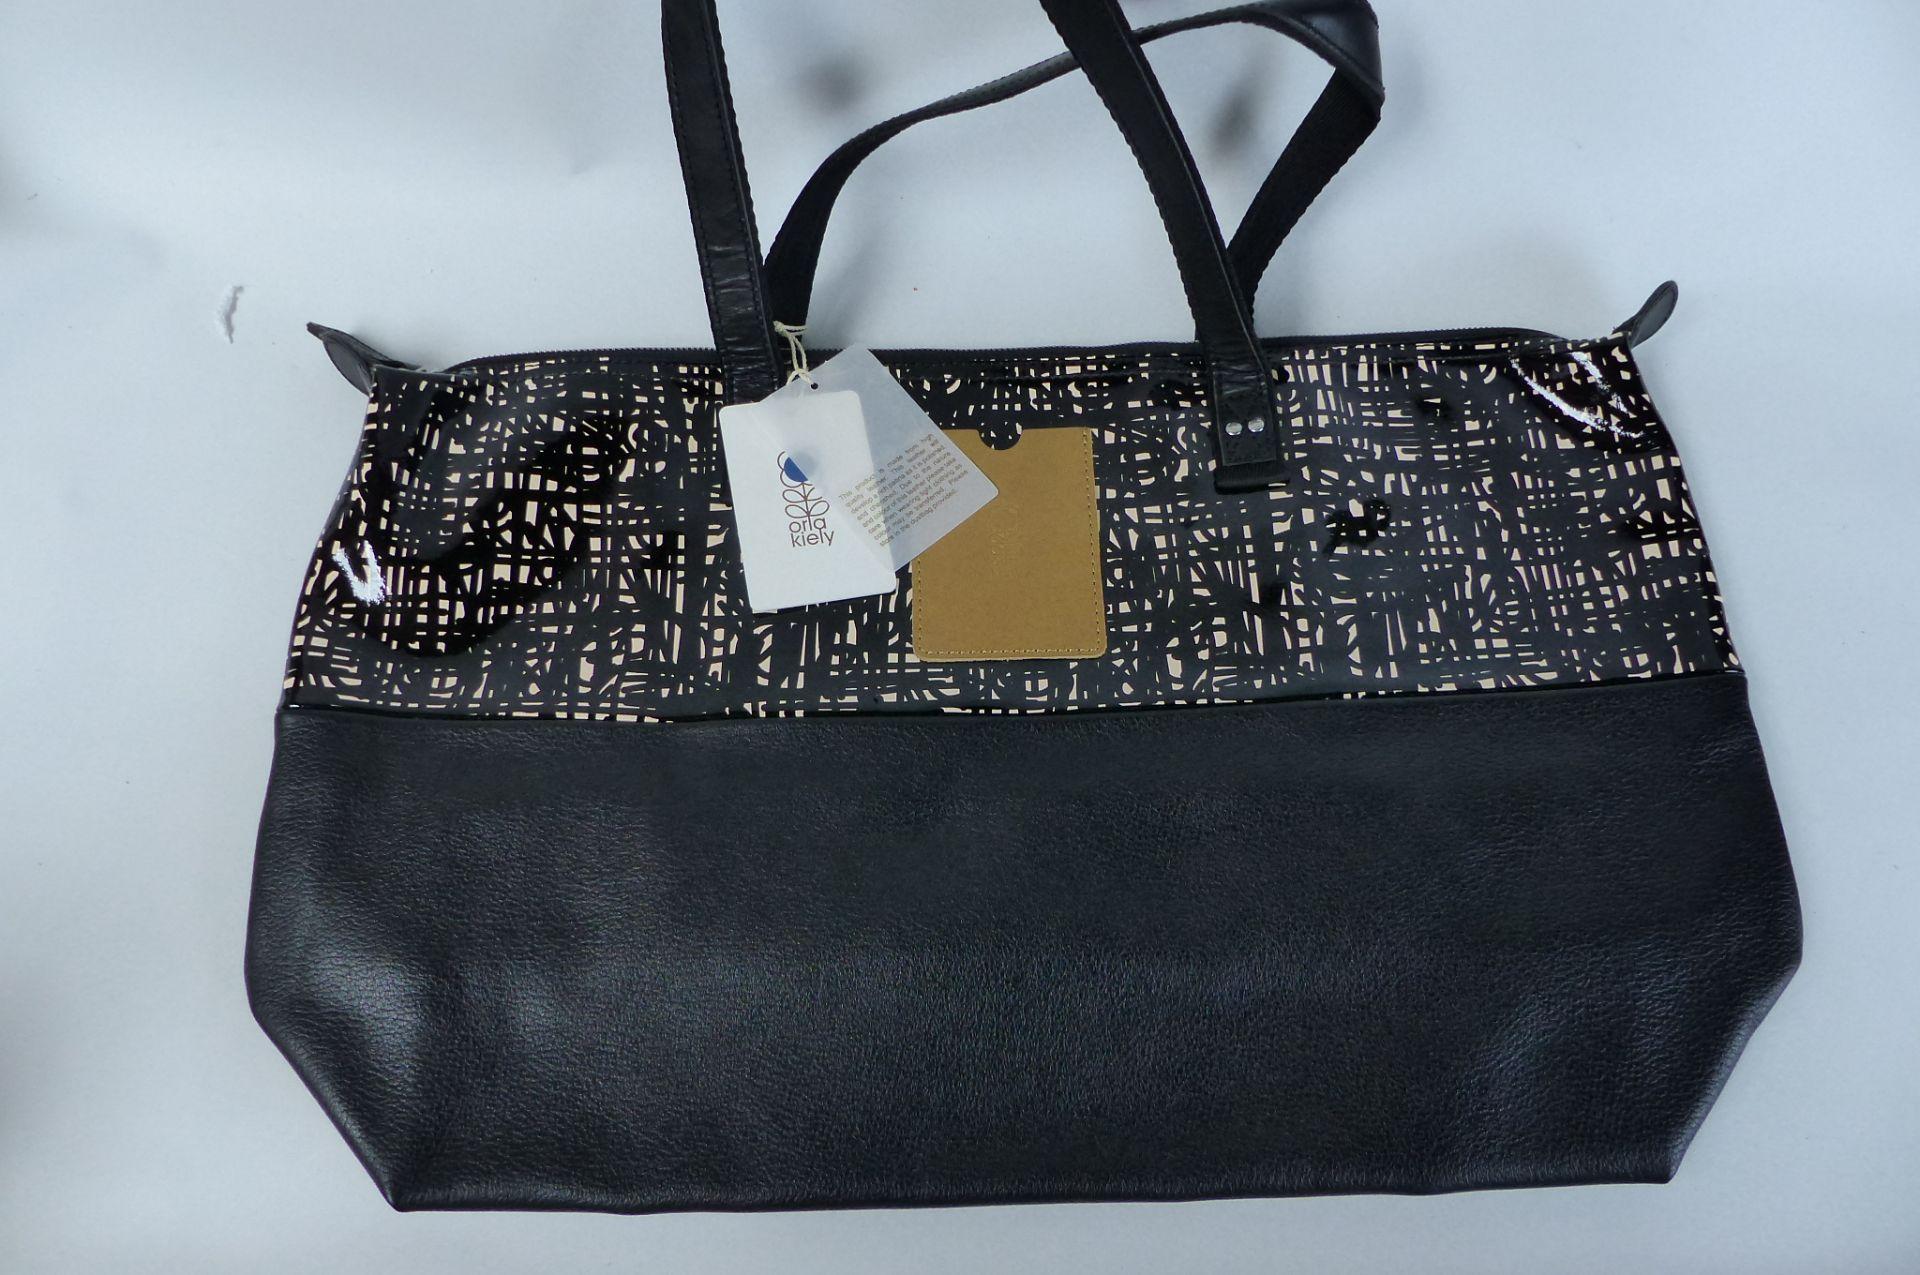 Orla Kiely Textured Bark Leather Shopper Bag Black